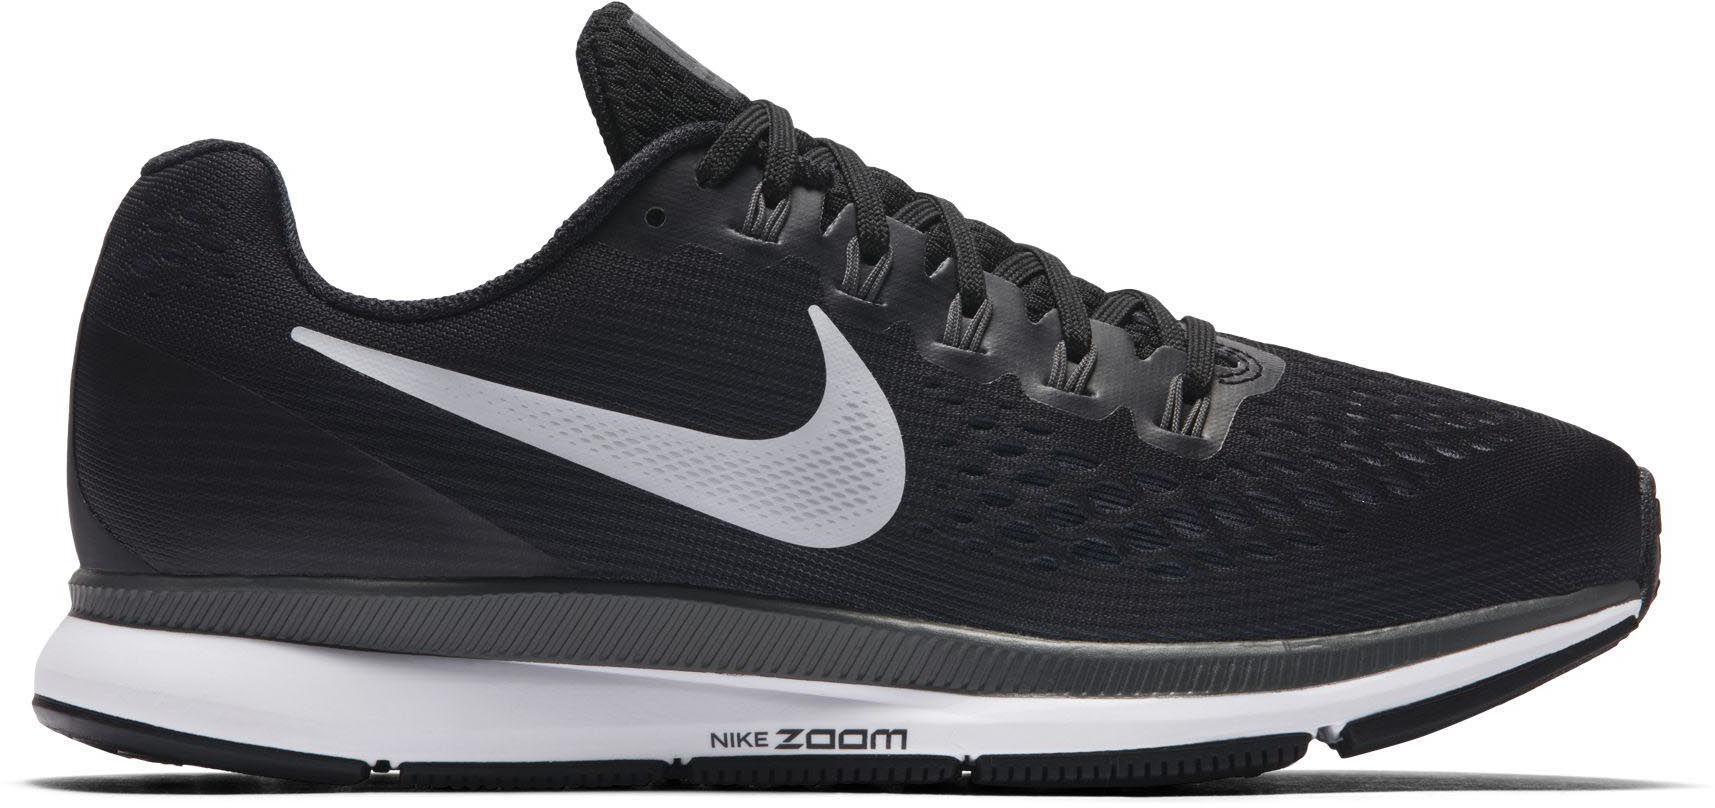 da Air Zoom Pegasus nere 34 Nike running donna Scarpe da 6gRx1